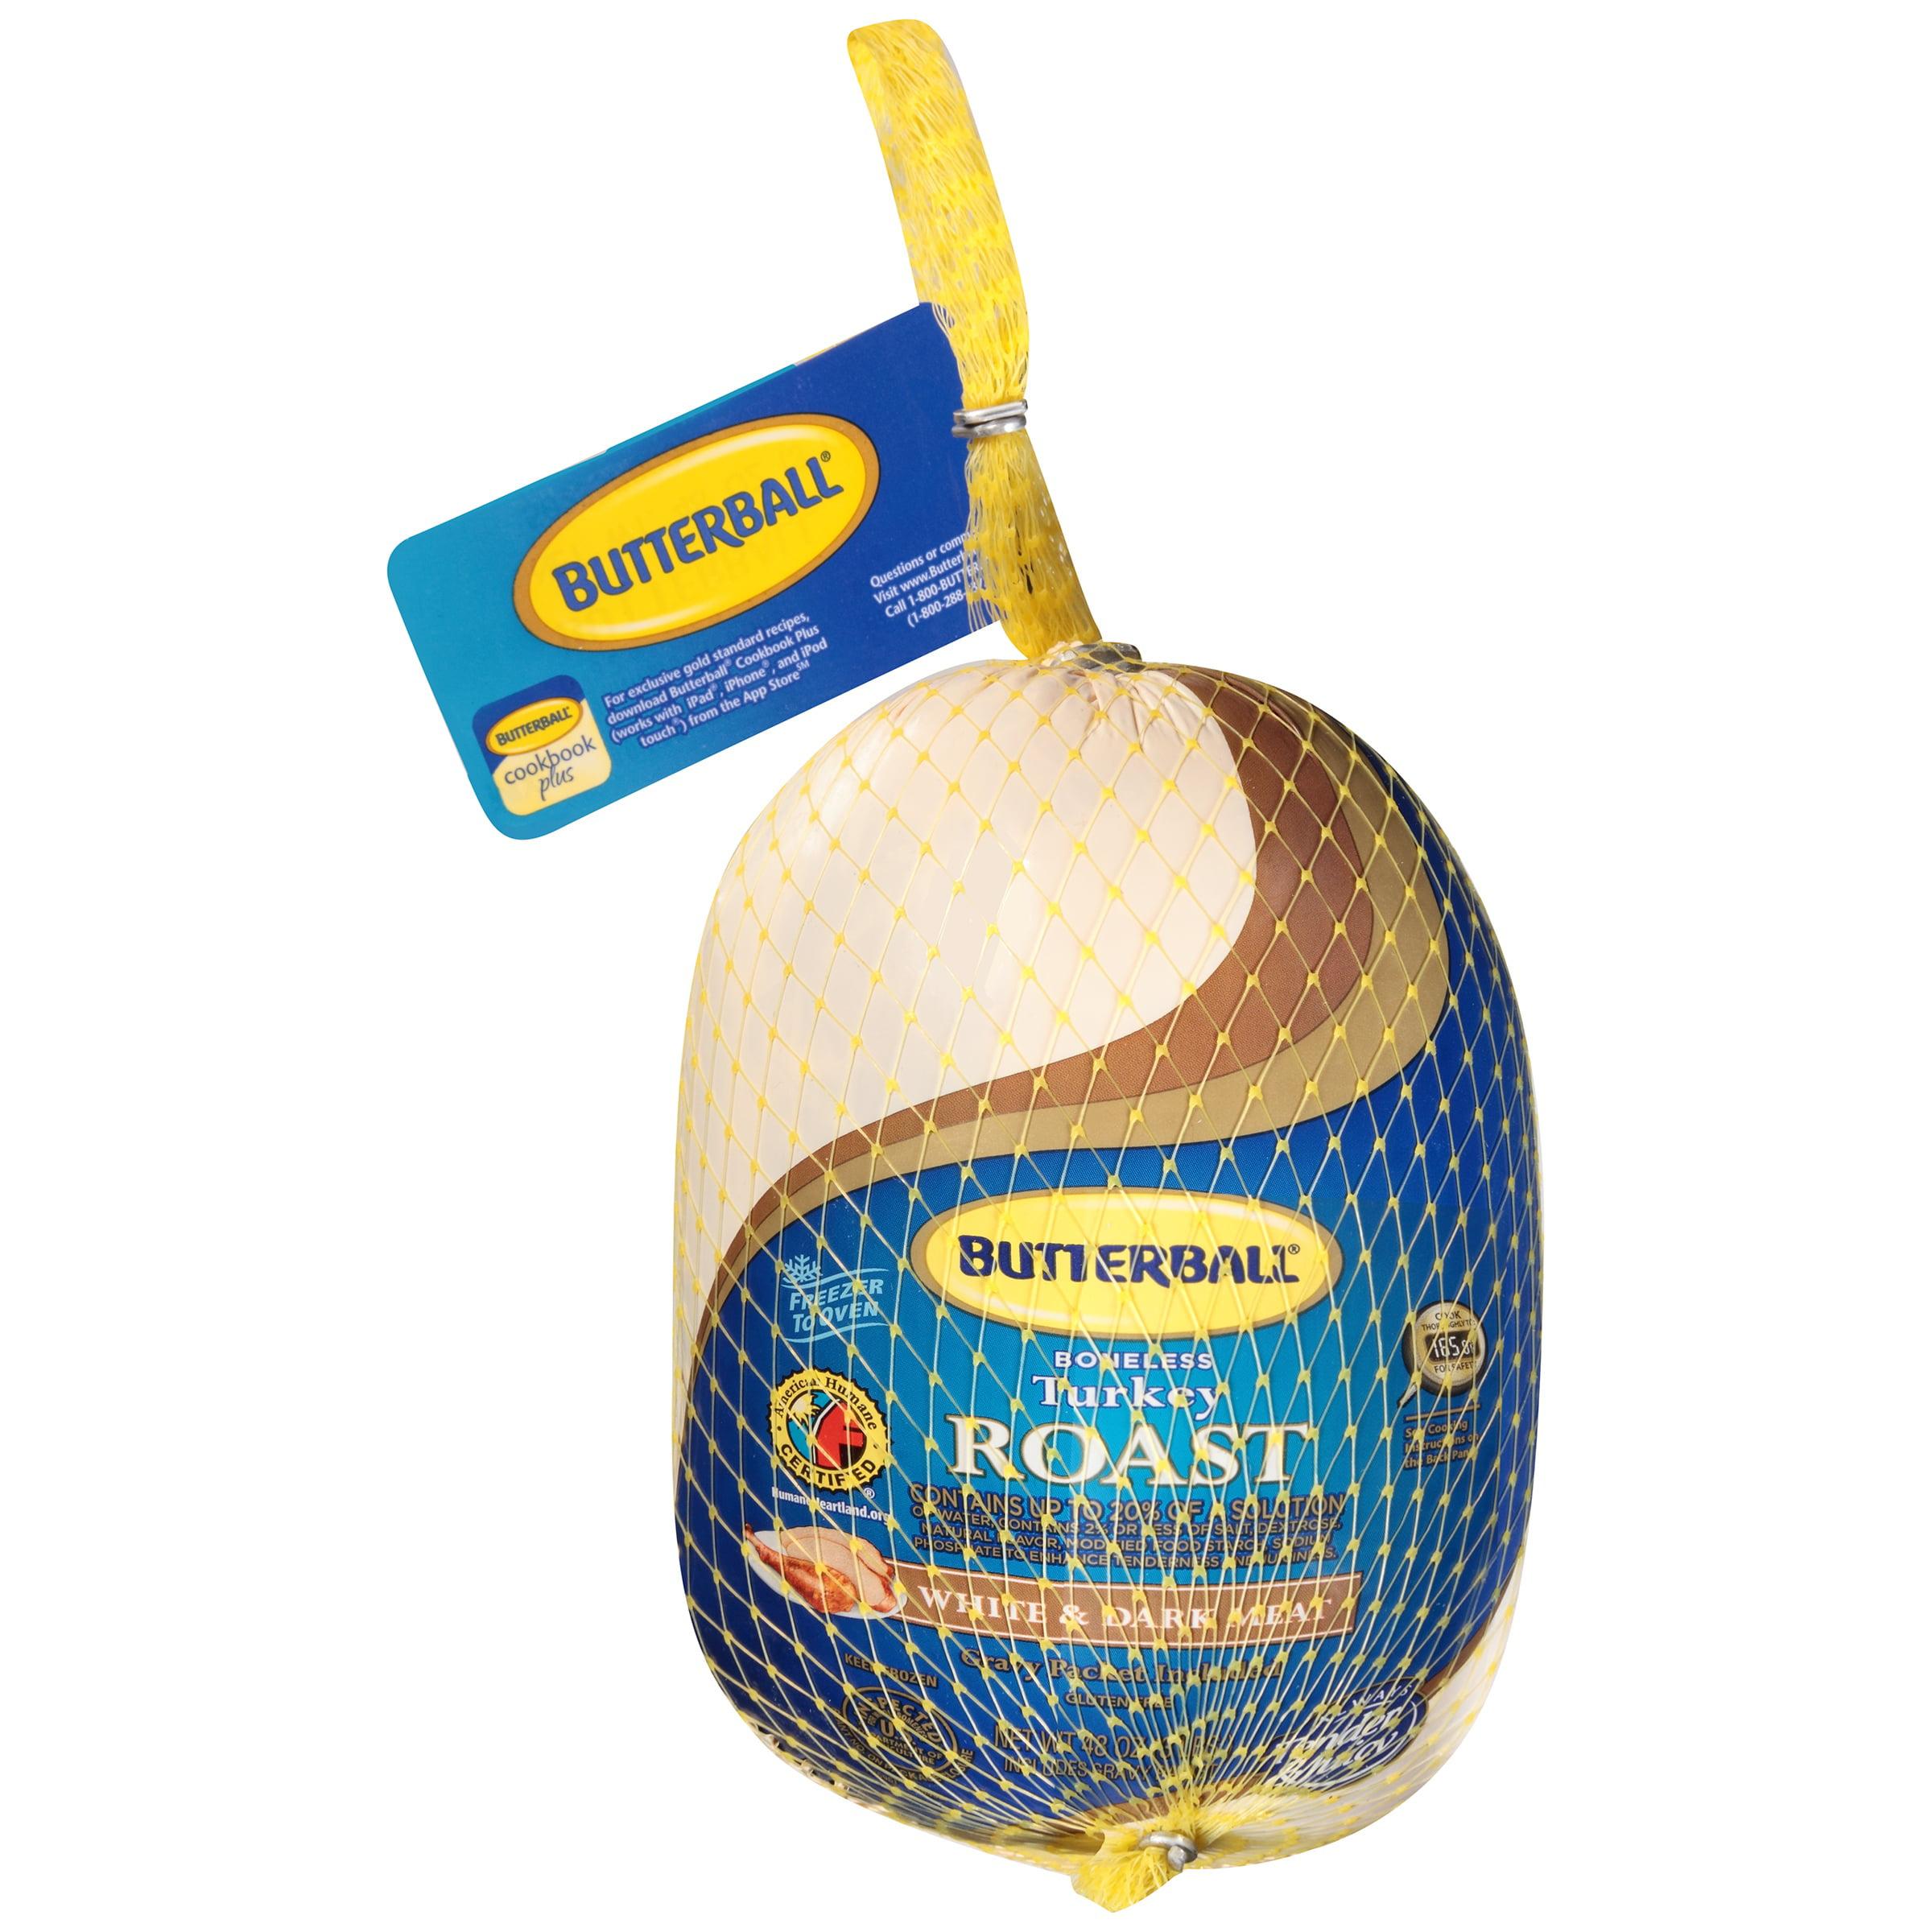 Butterball White & Dark Meat Boneless Turkey Roast 48 oz. Bag by Butterball, LLC